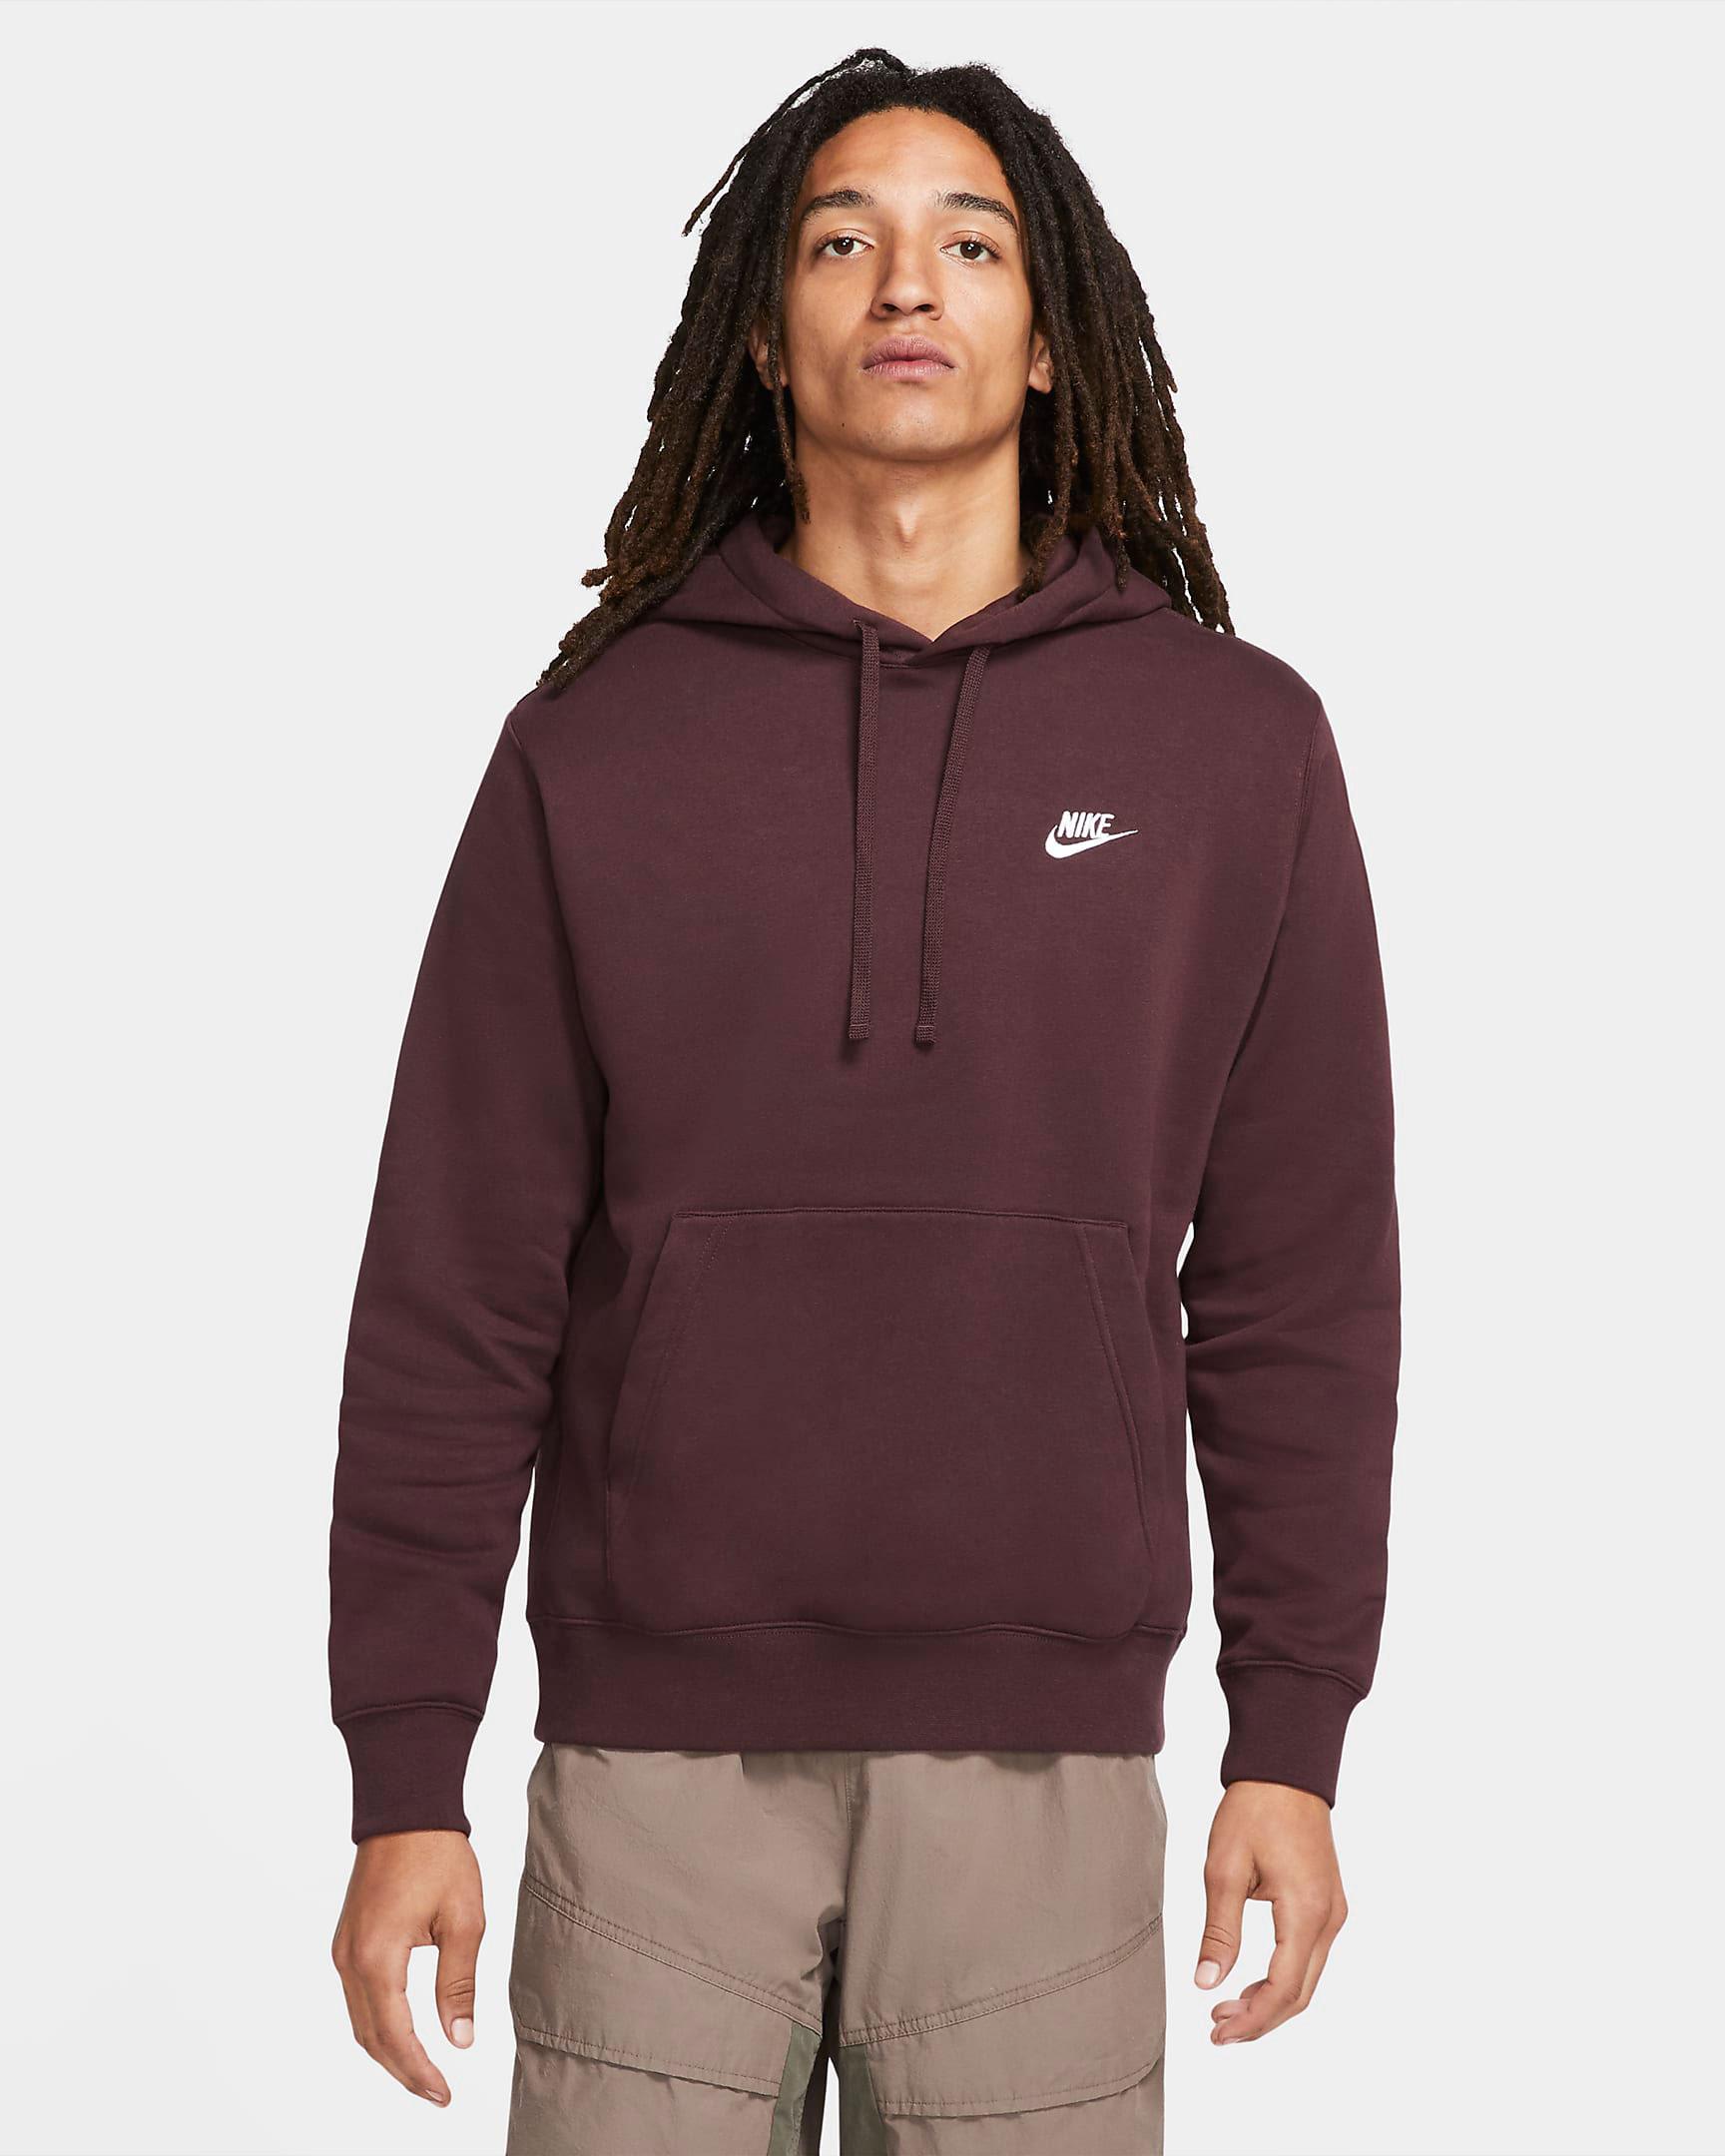 nike-club-fleece-hoodie-mahogany-brown-3